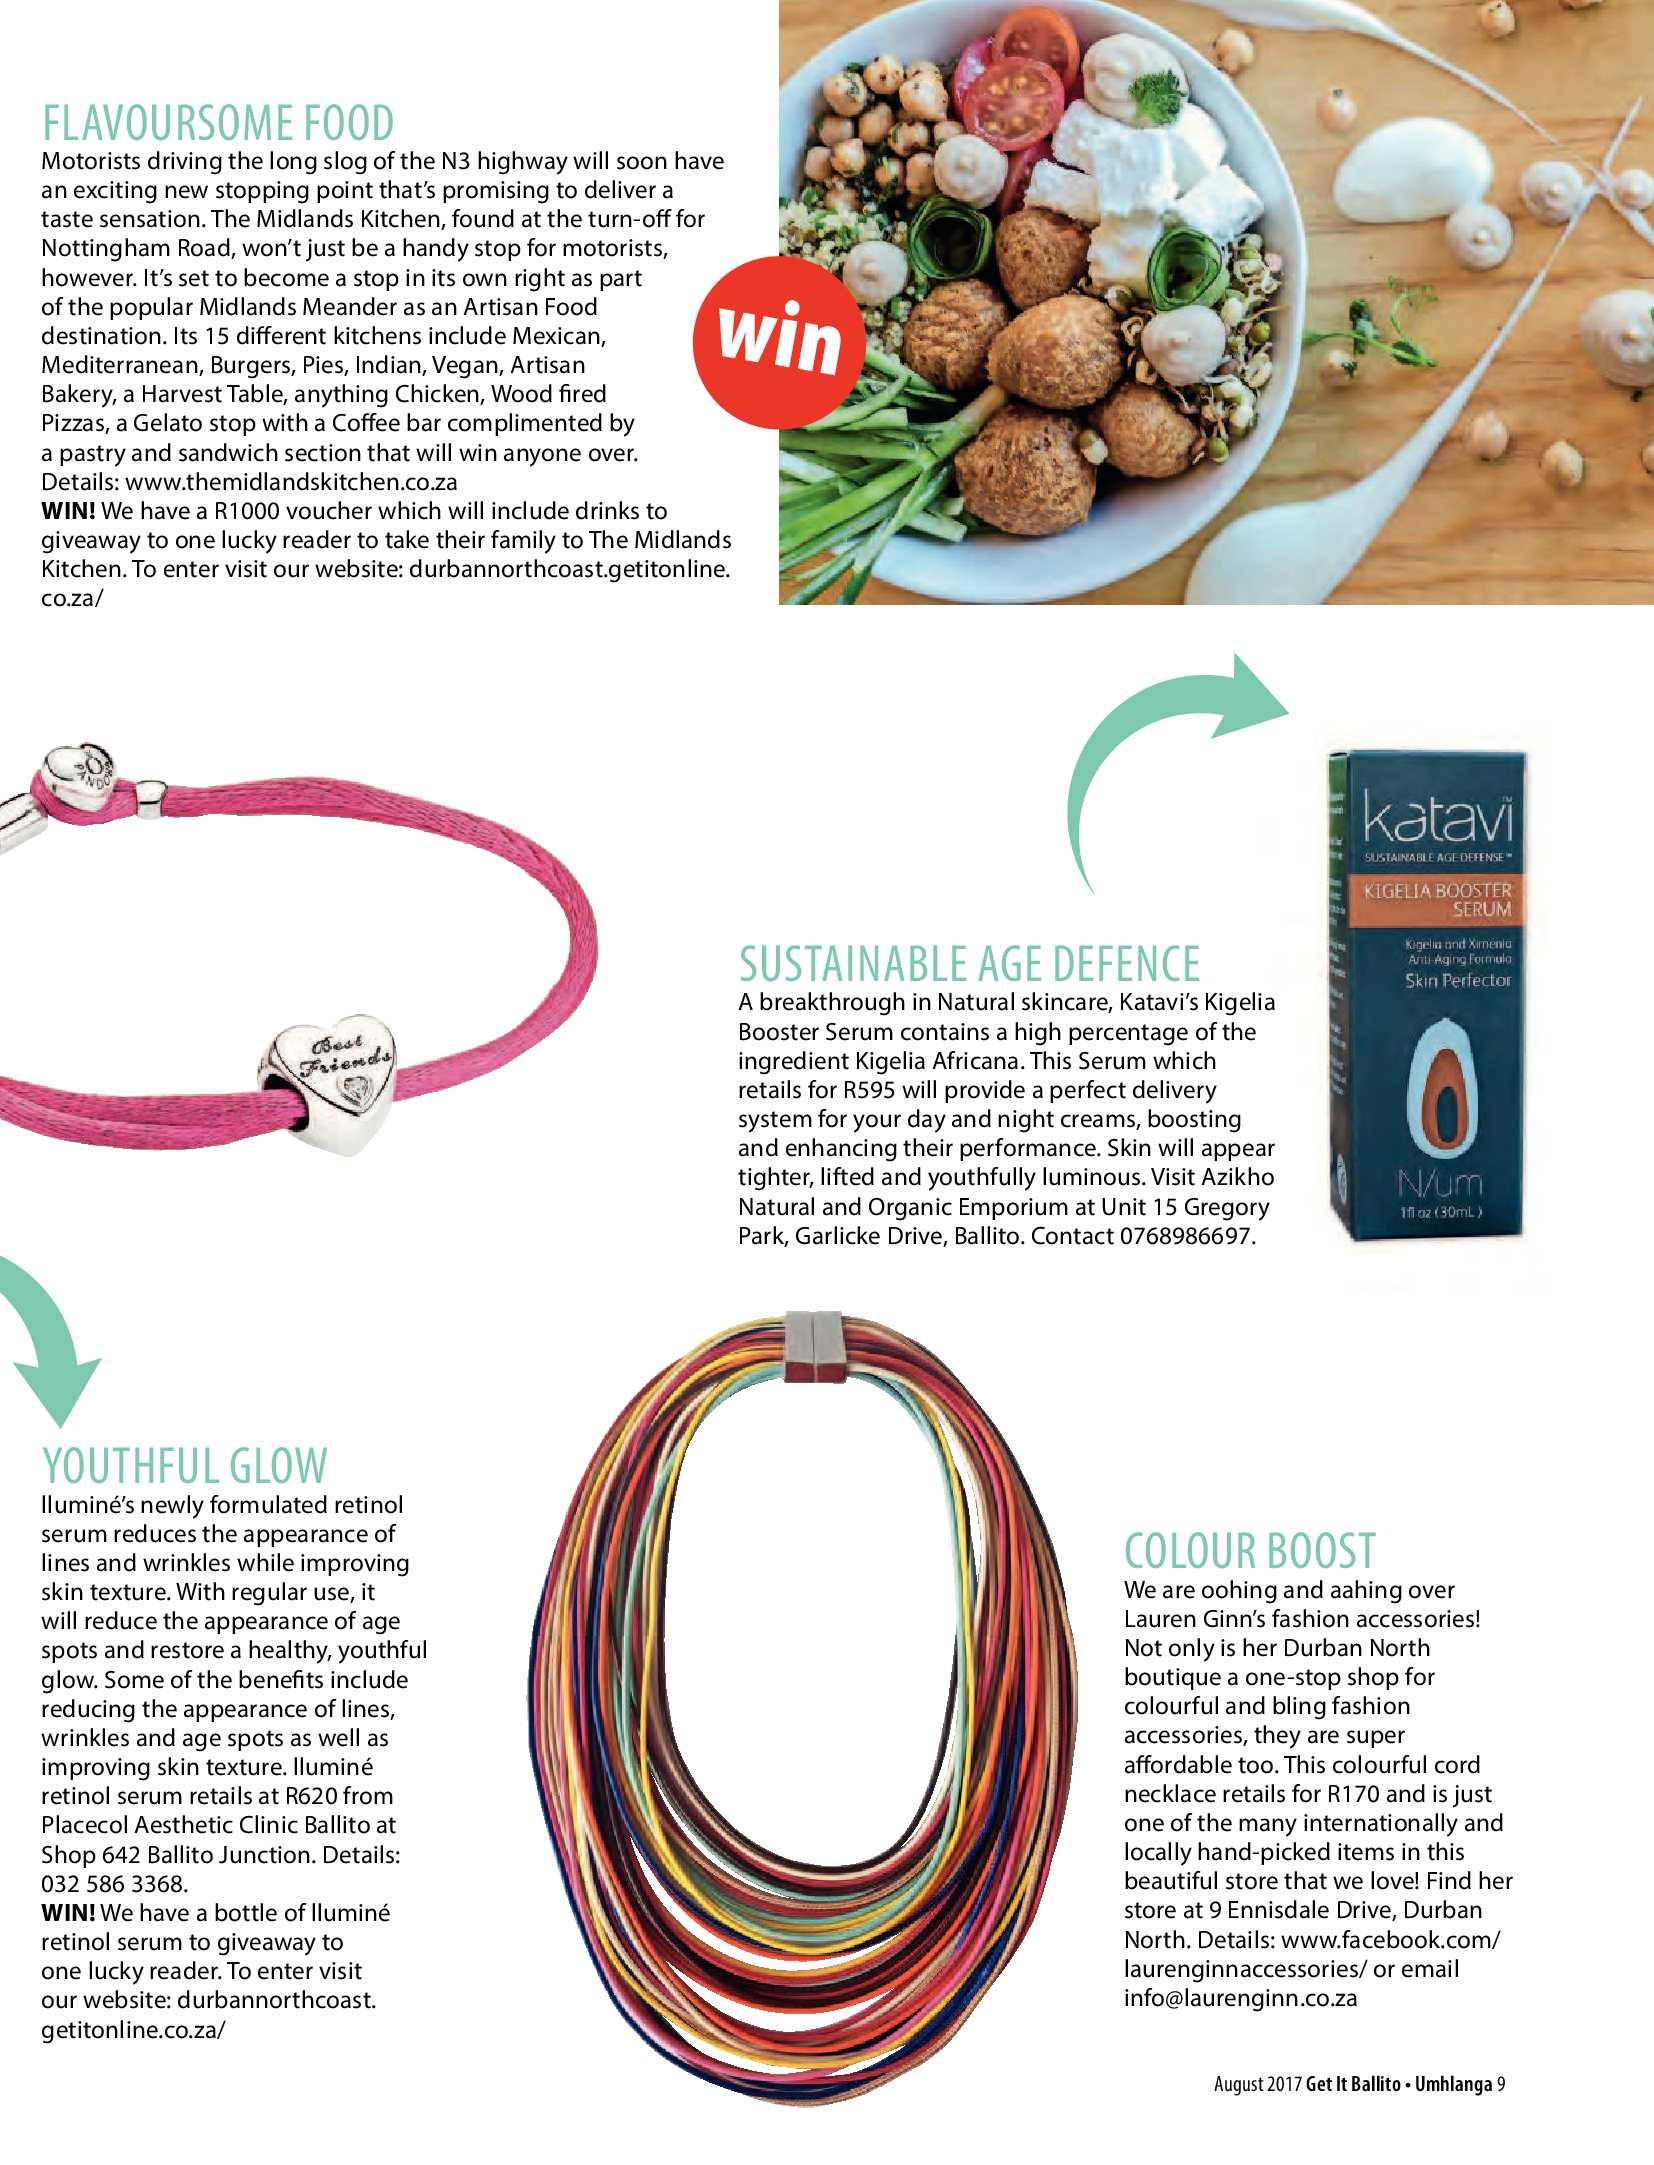 get-magazine-ballitoumhlanga-august-2017-epapers-page-11